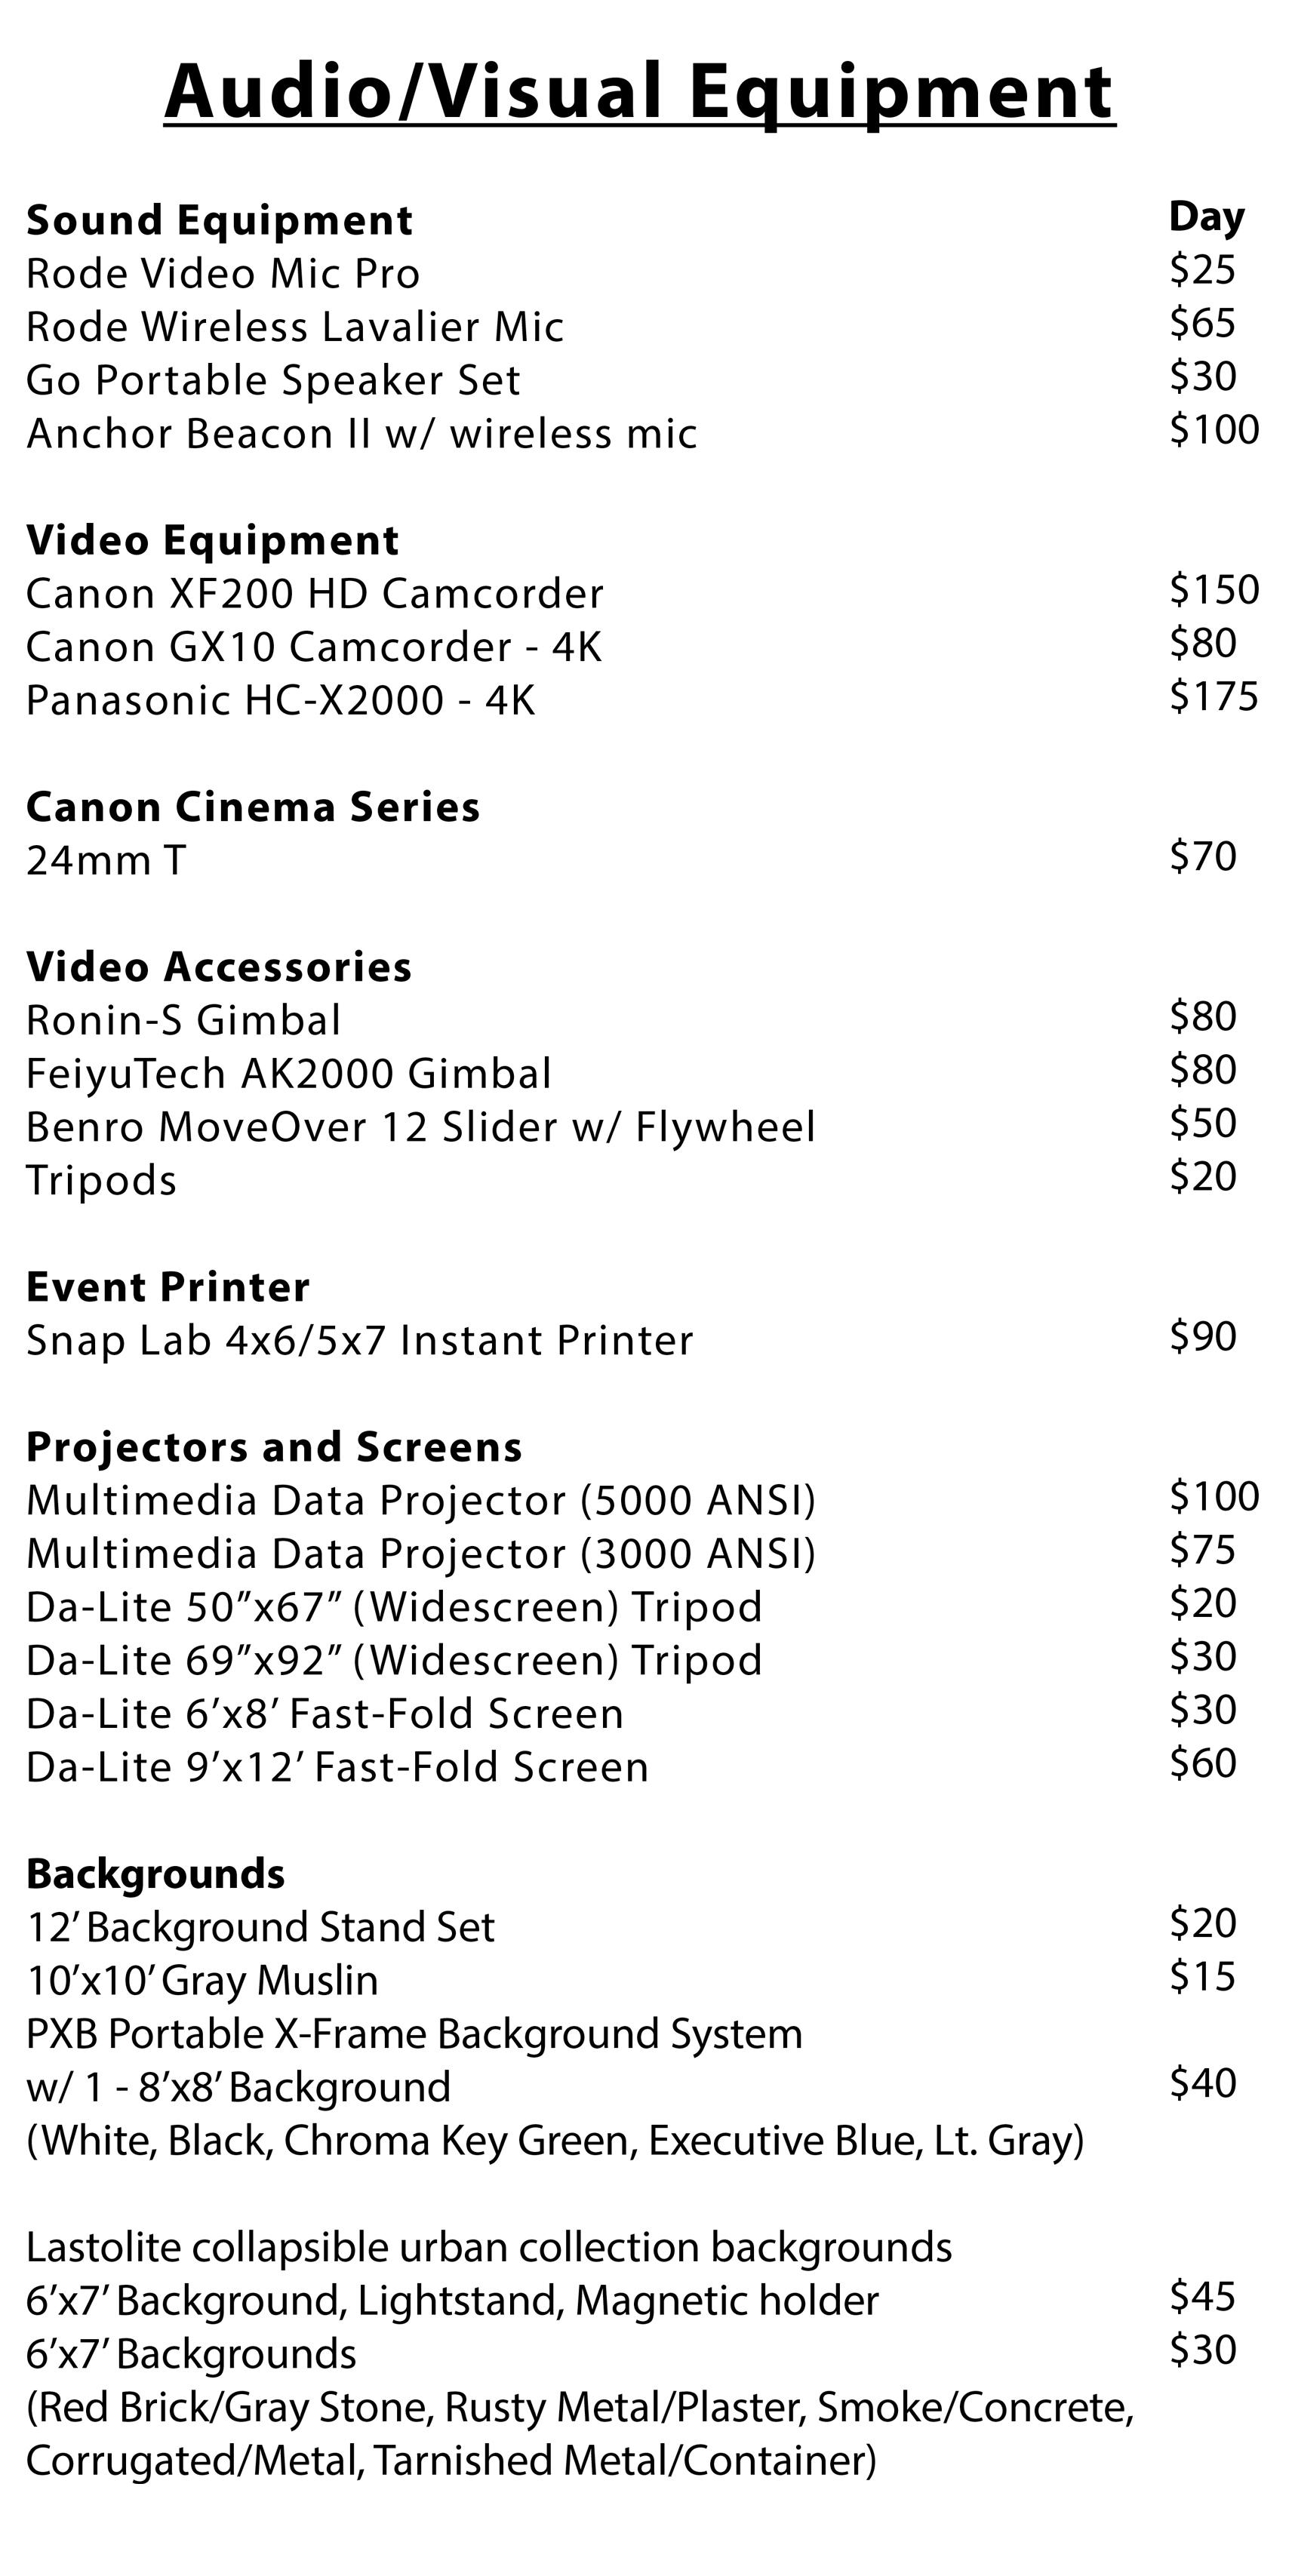 DSLRs, Lenses, and Flashes Rental List